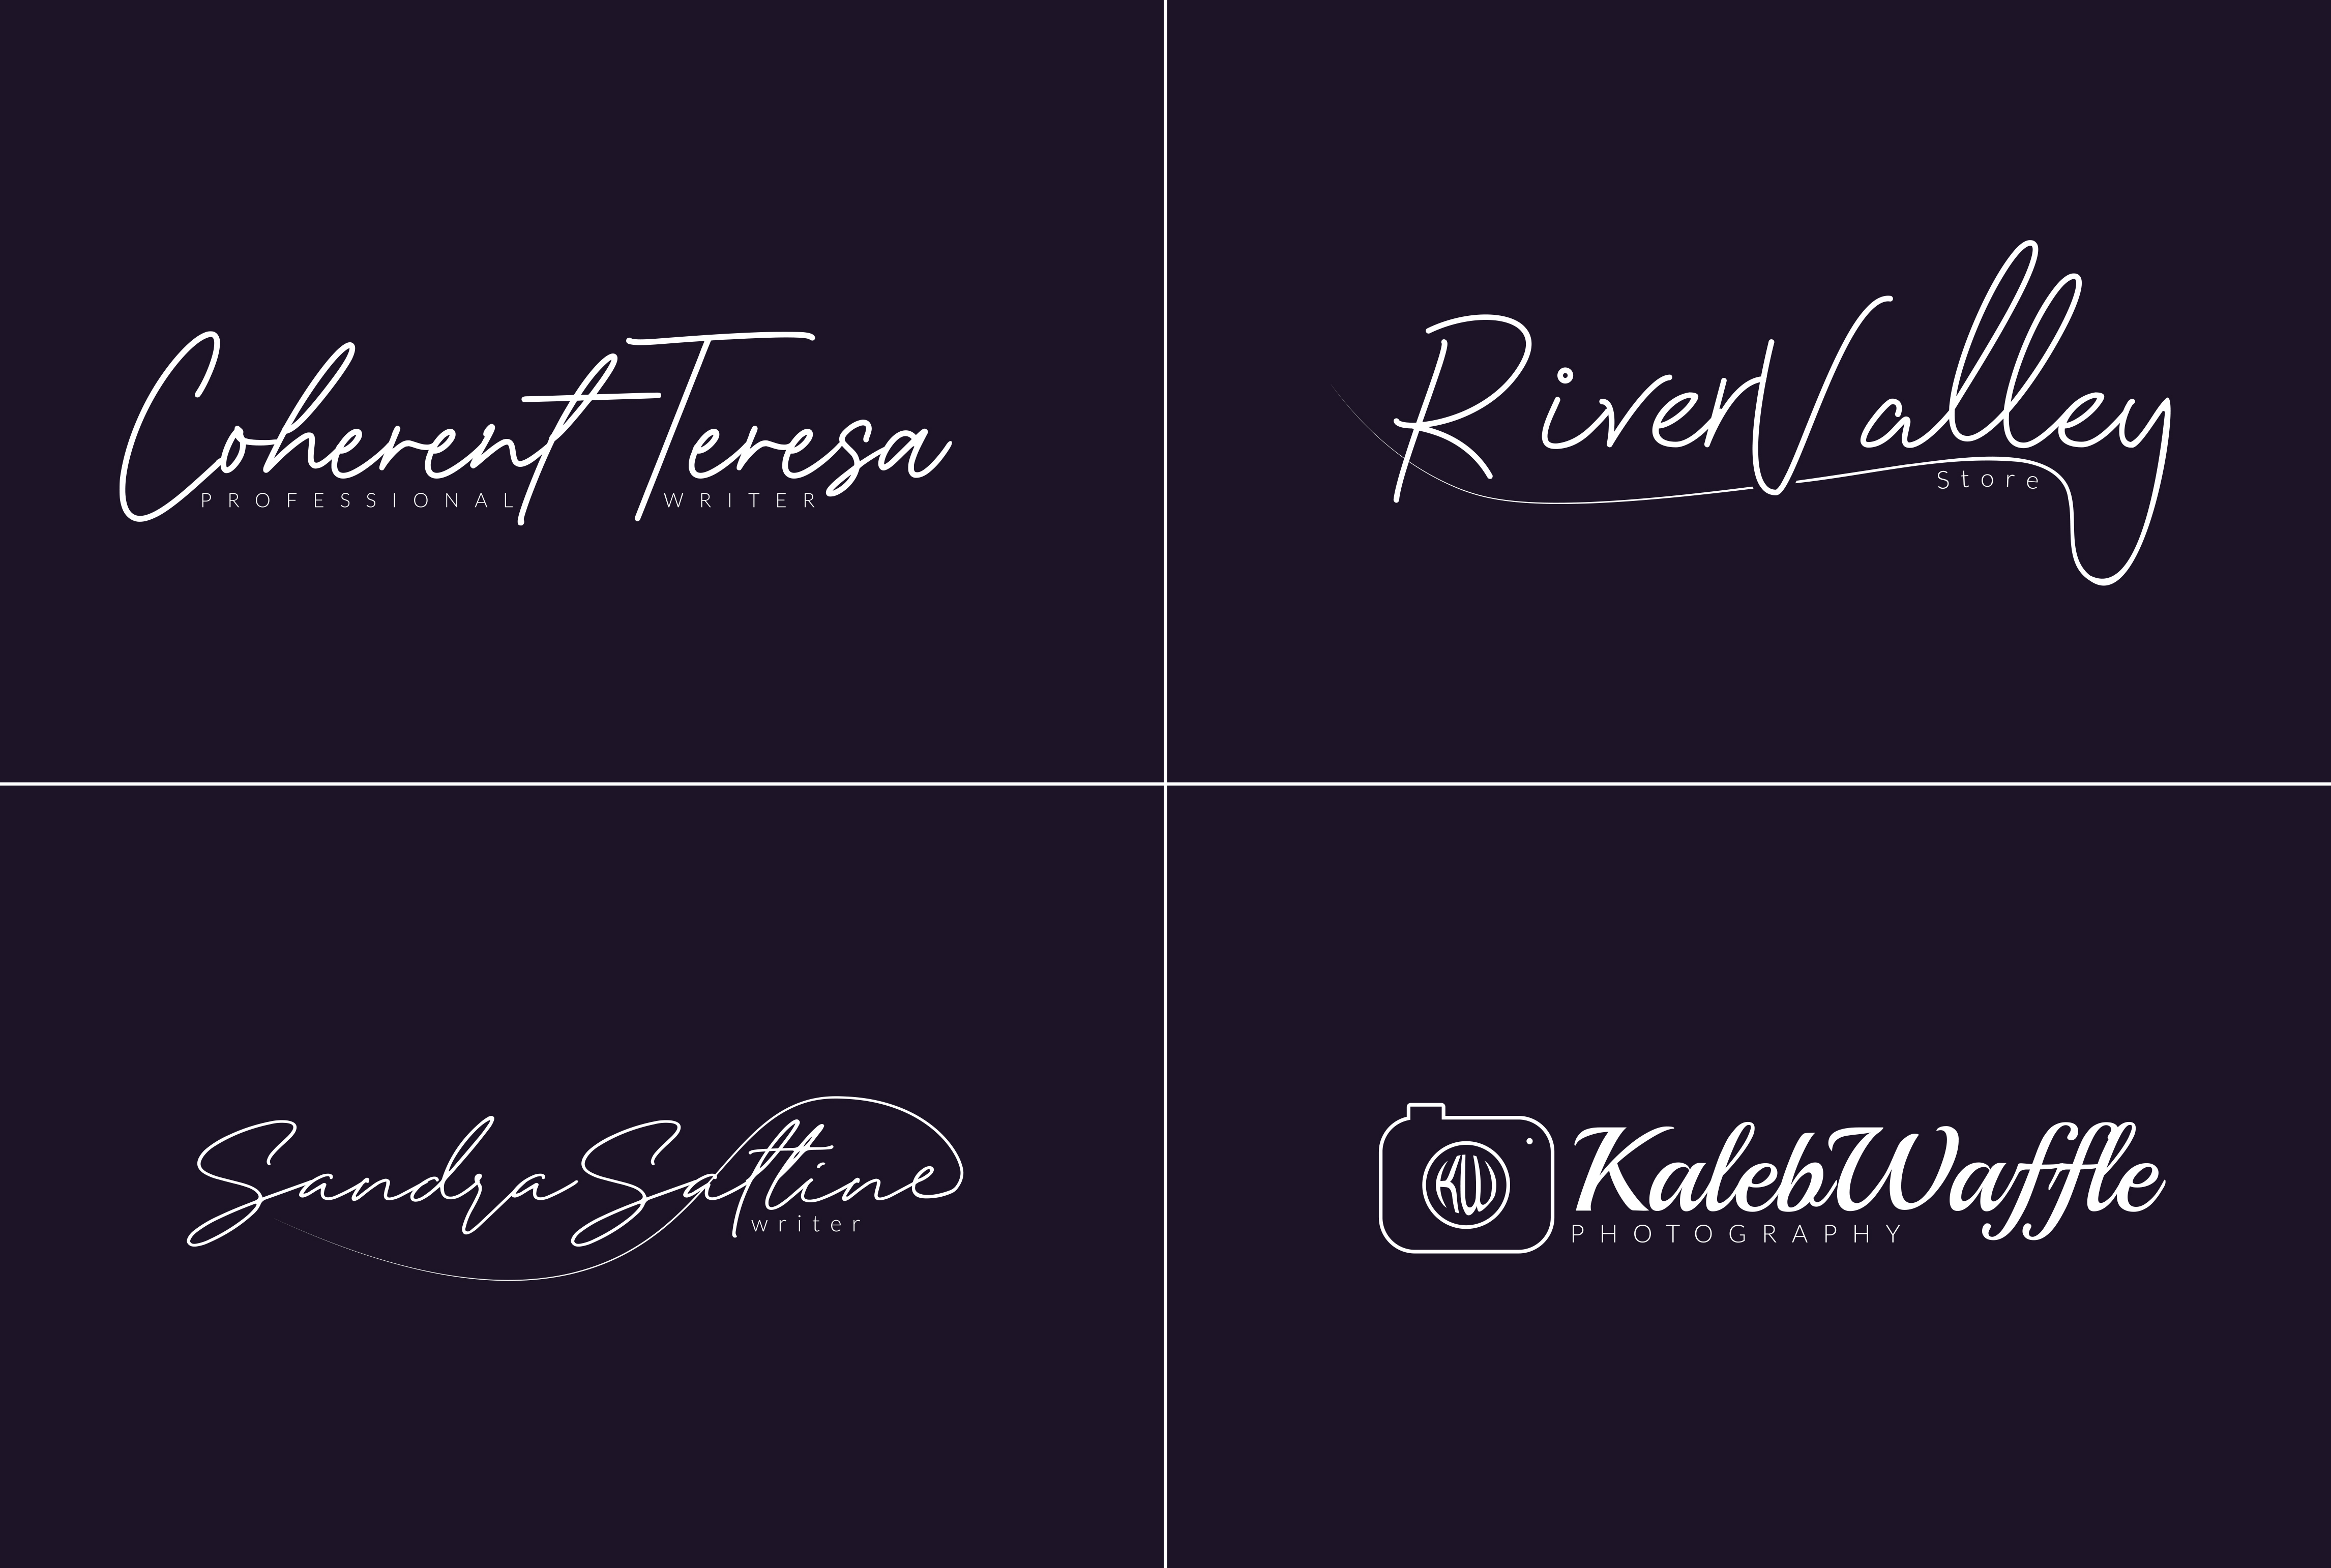 I will do clean signature logo,  script logo,  handwritten or text logo in 12hrs